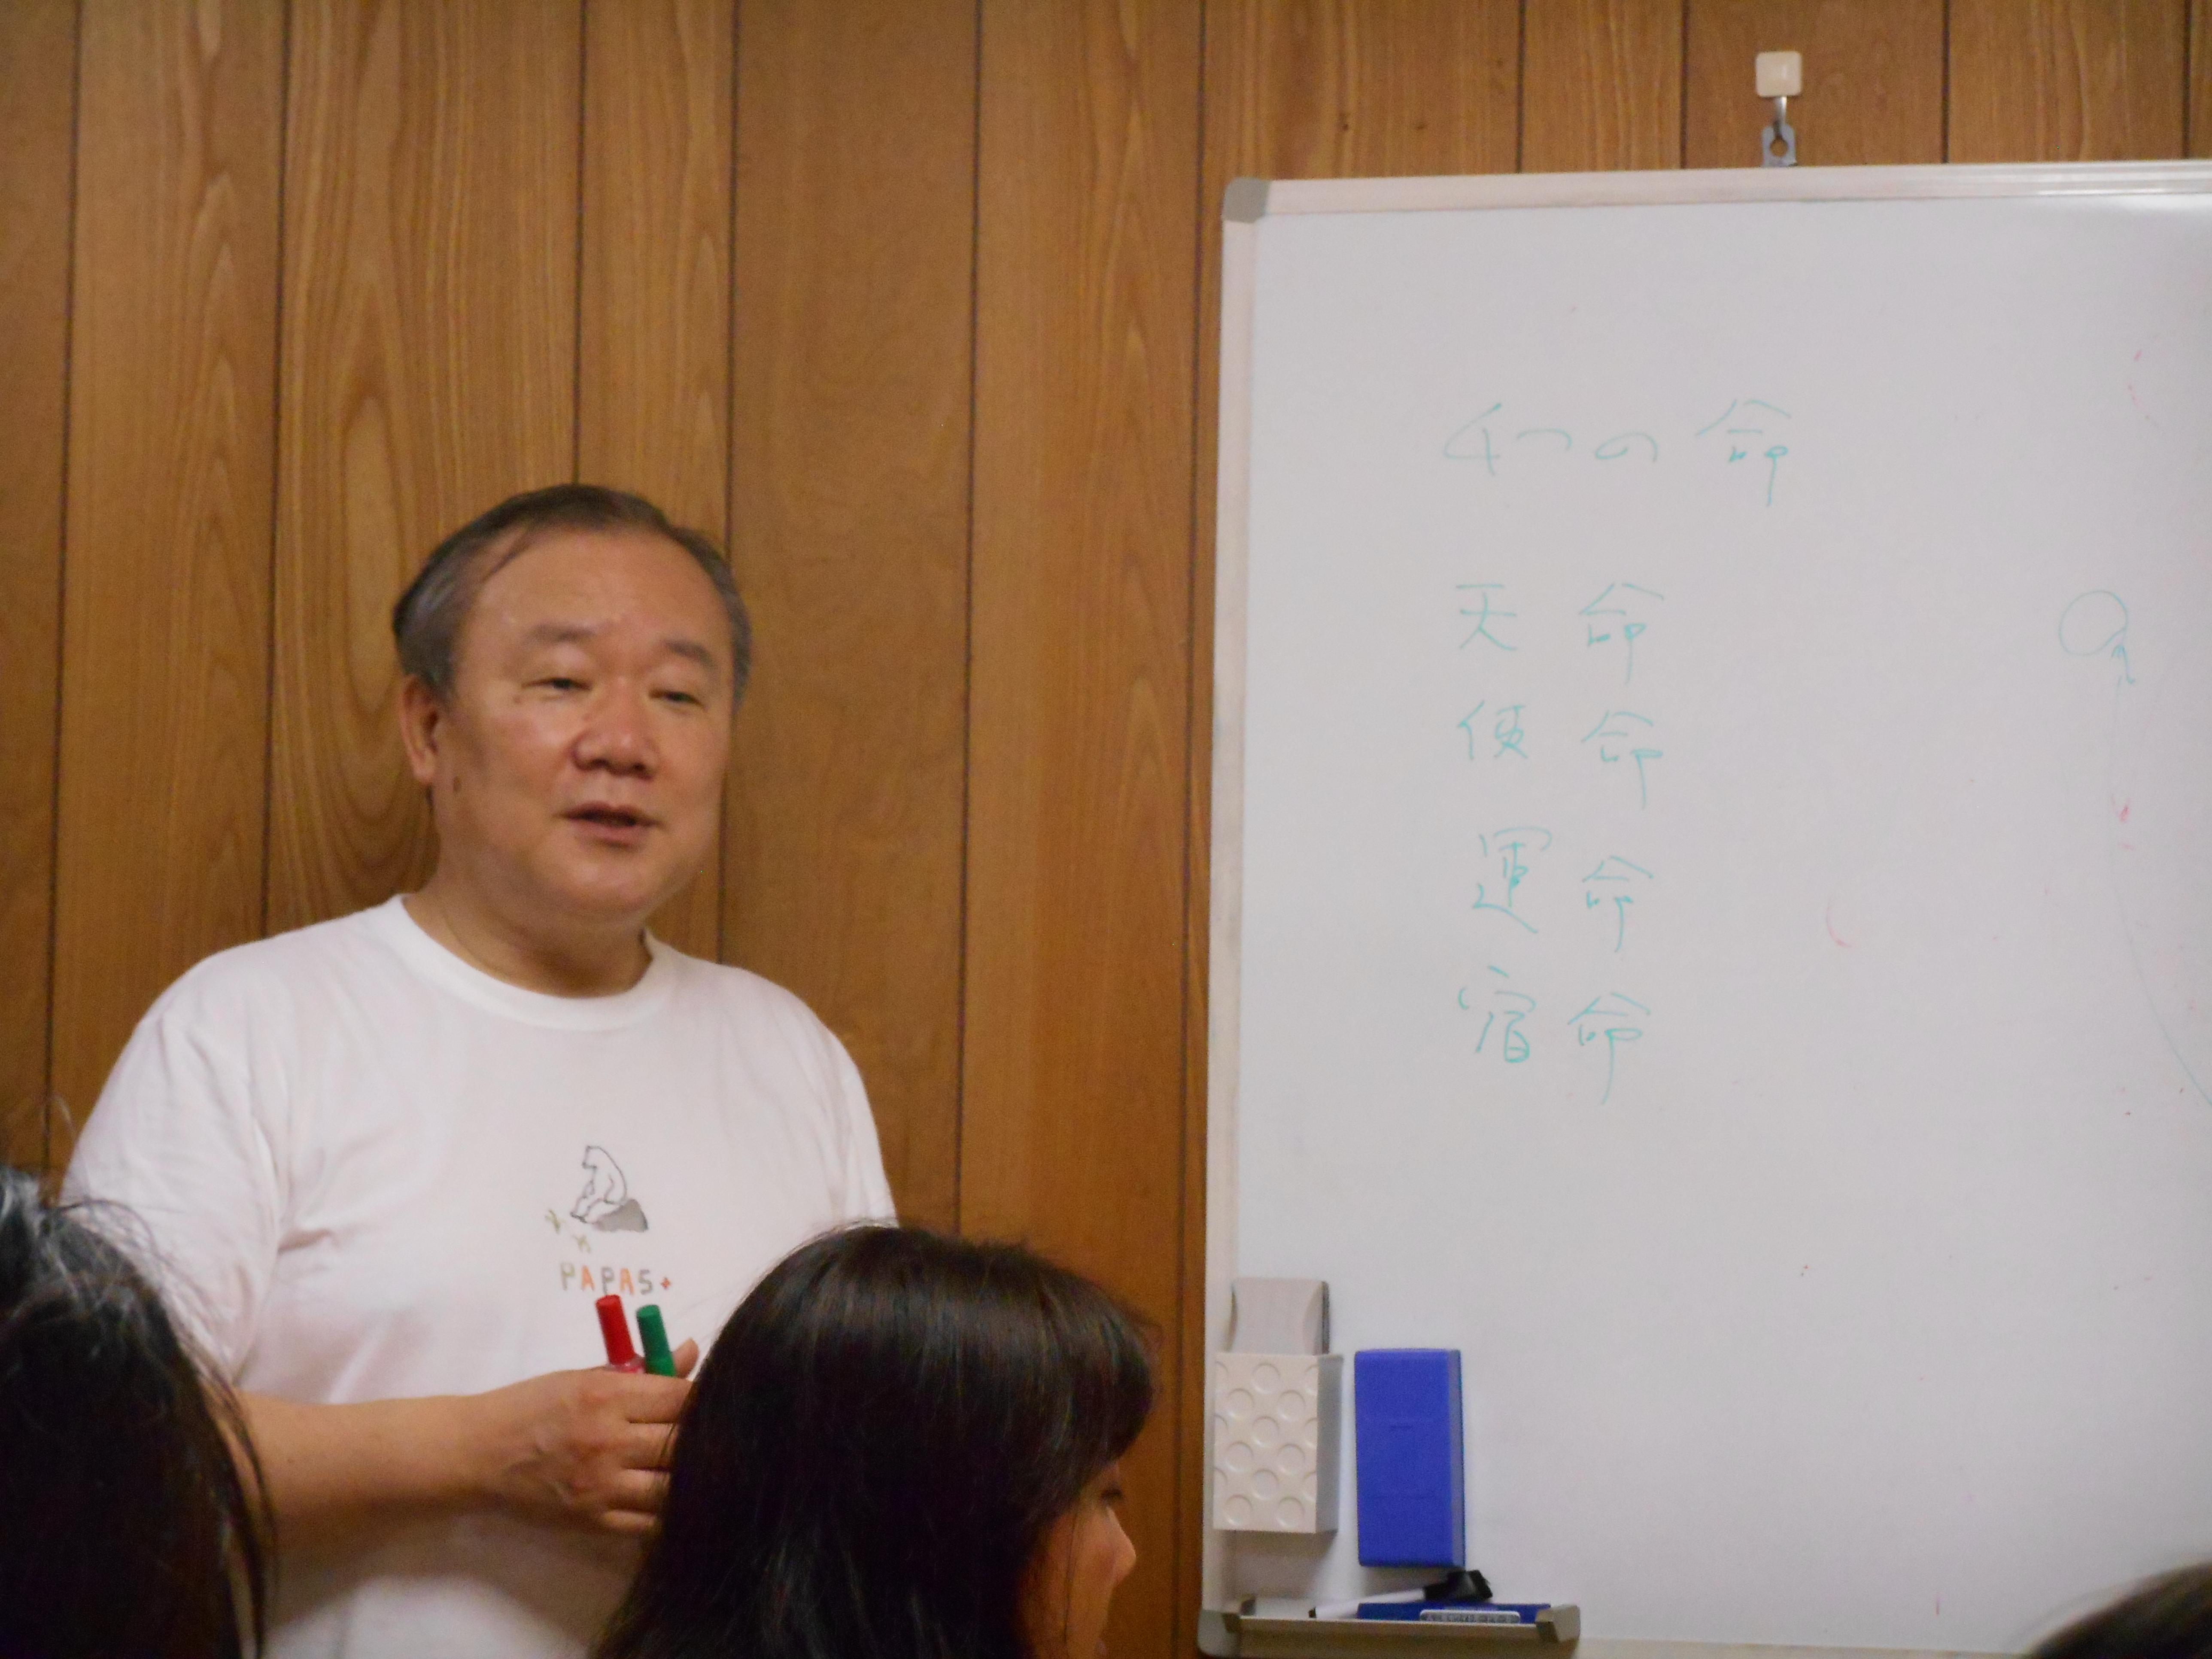 DSCN1727 - 池川明先生の愛の子育て塾第13期生(2018年8月~2018年12月)募集中です。